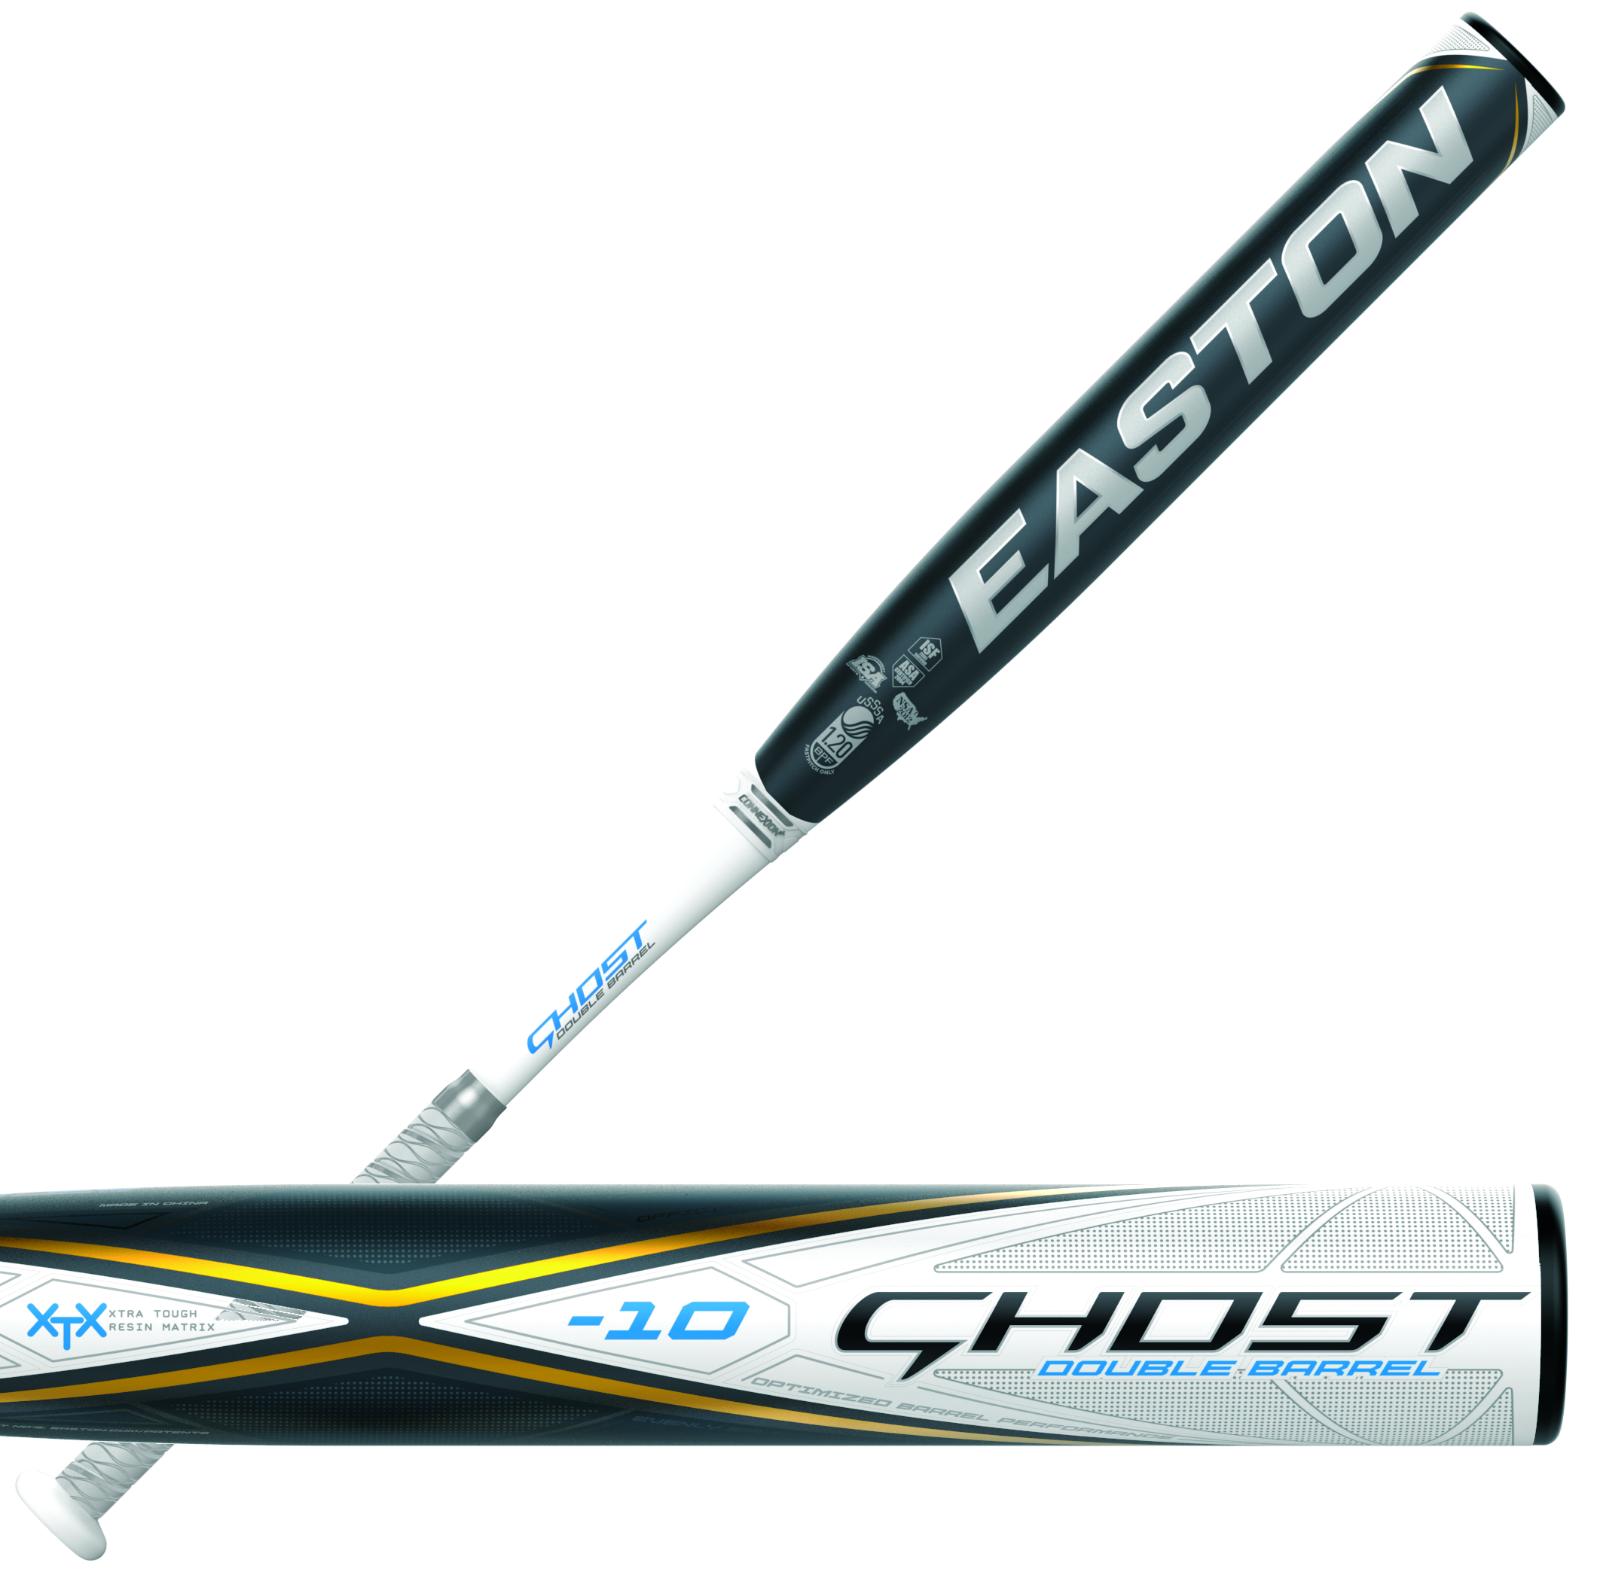 "2020 Easton Ghost Double Barrel -10 34""/24 oz. Fastpitch Sof"